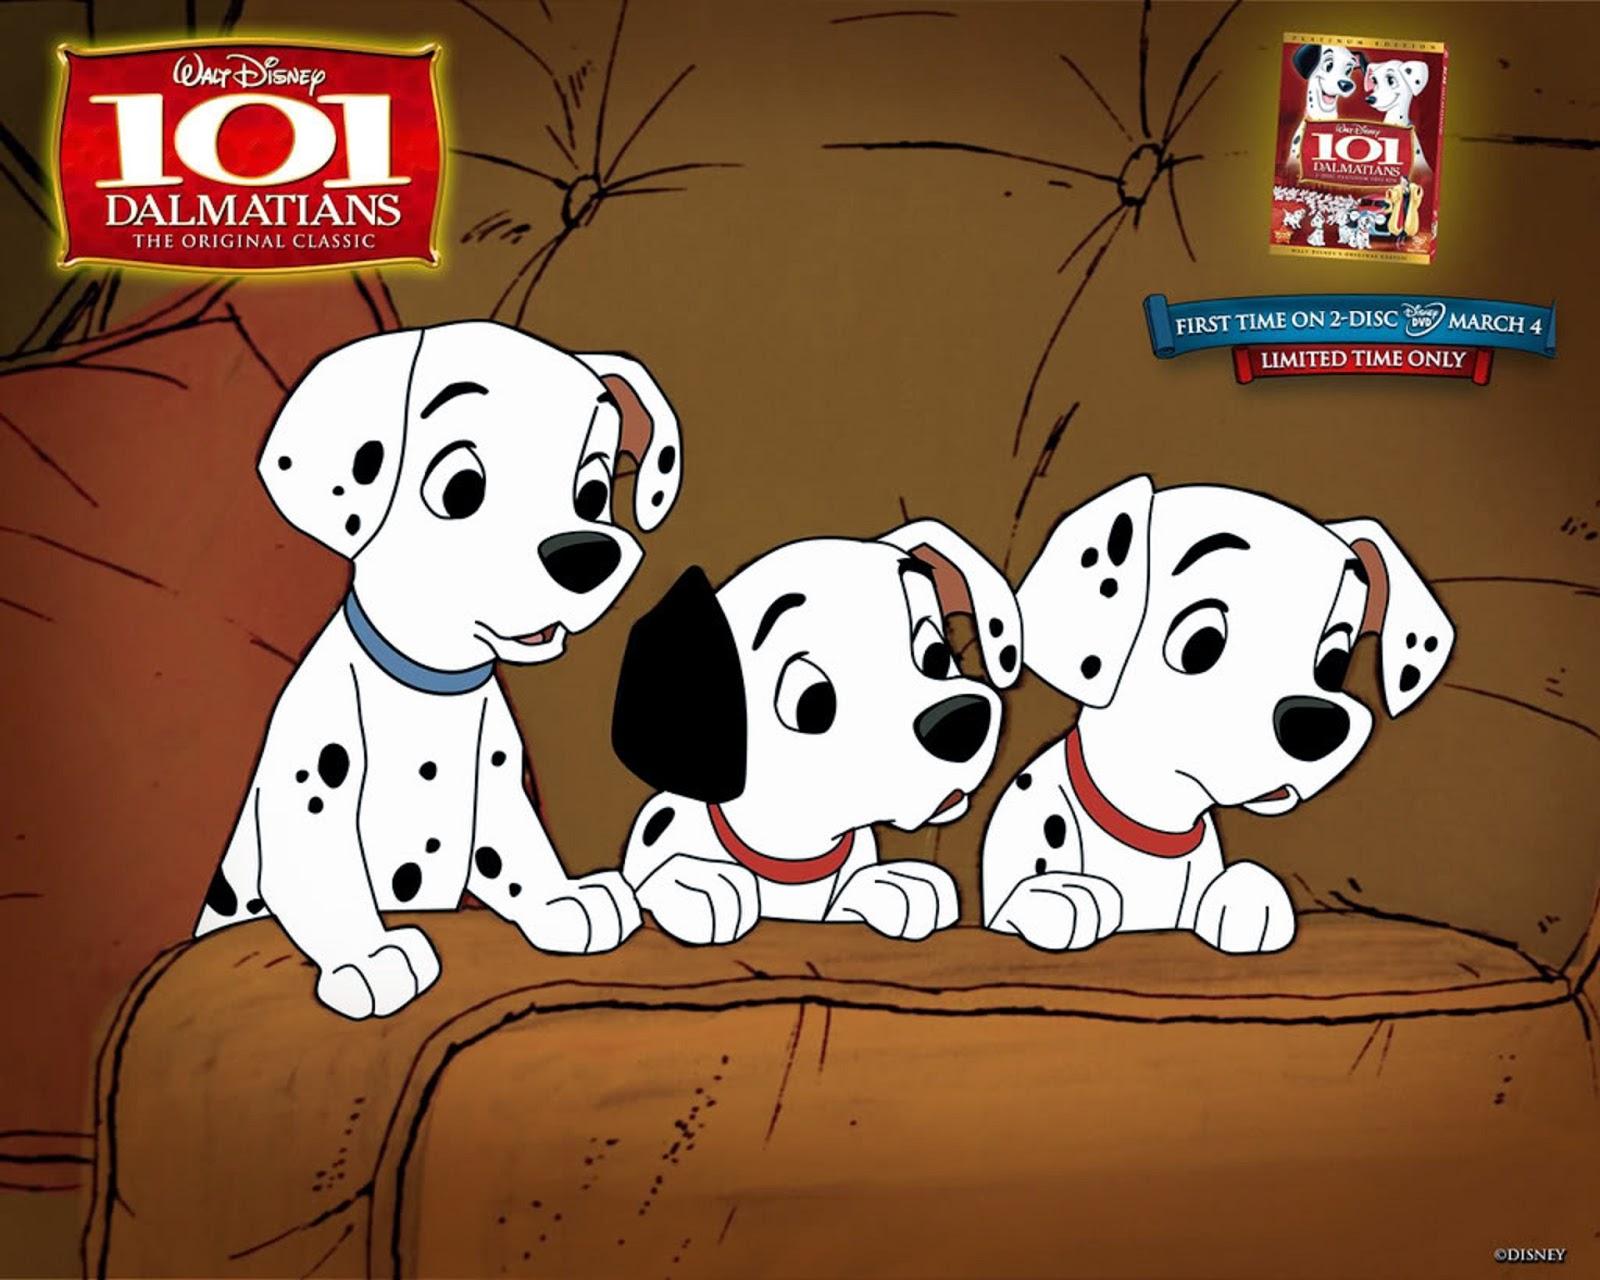 disney cartoon 101 dalmatians photo wallpapers free all hd